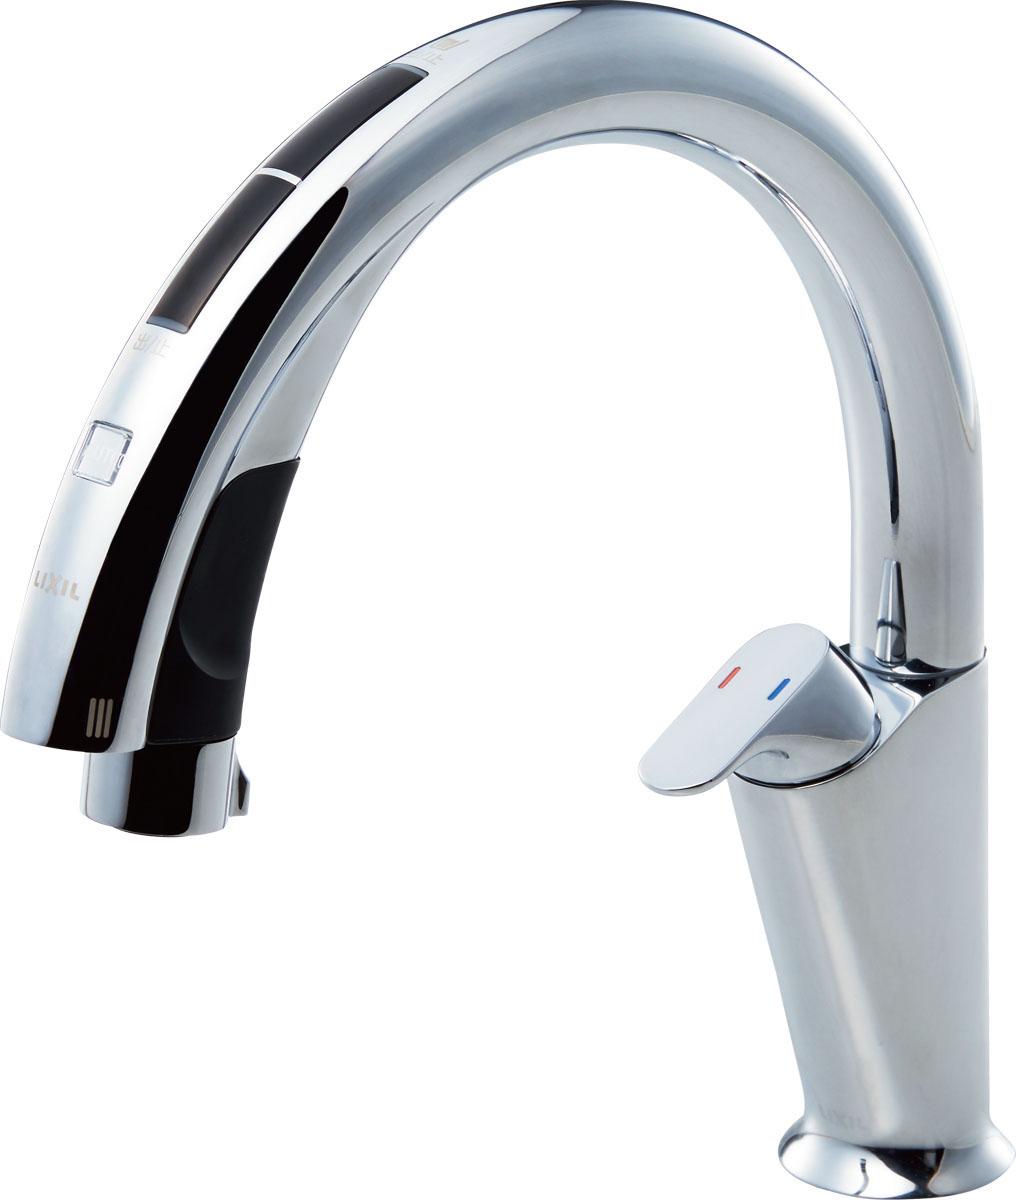 INAX LIXIL キッチン水栓 JF-NA411S (JW) キッチン用タッチレス水栓 ナビッシュハンズフリー (浄水器ビルトイン型) A10タイプ イナックス リクシル